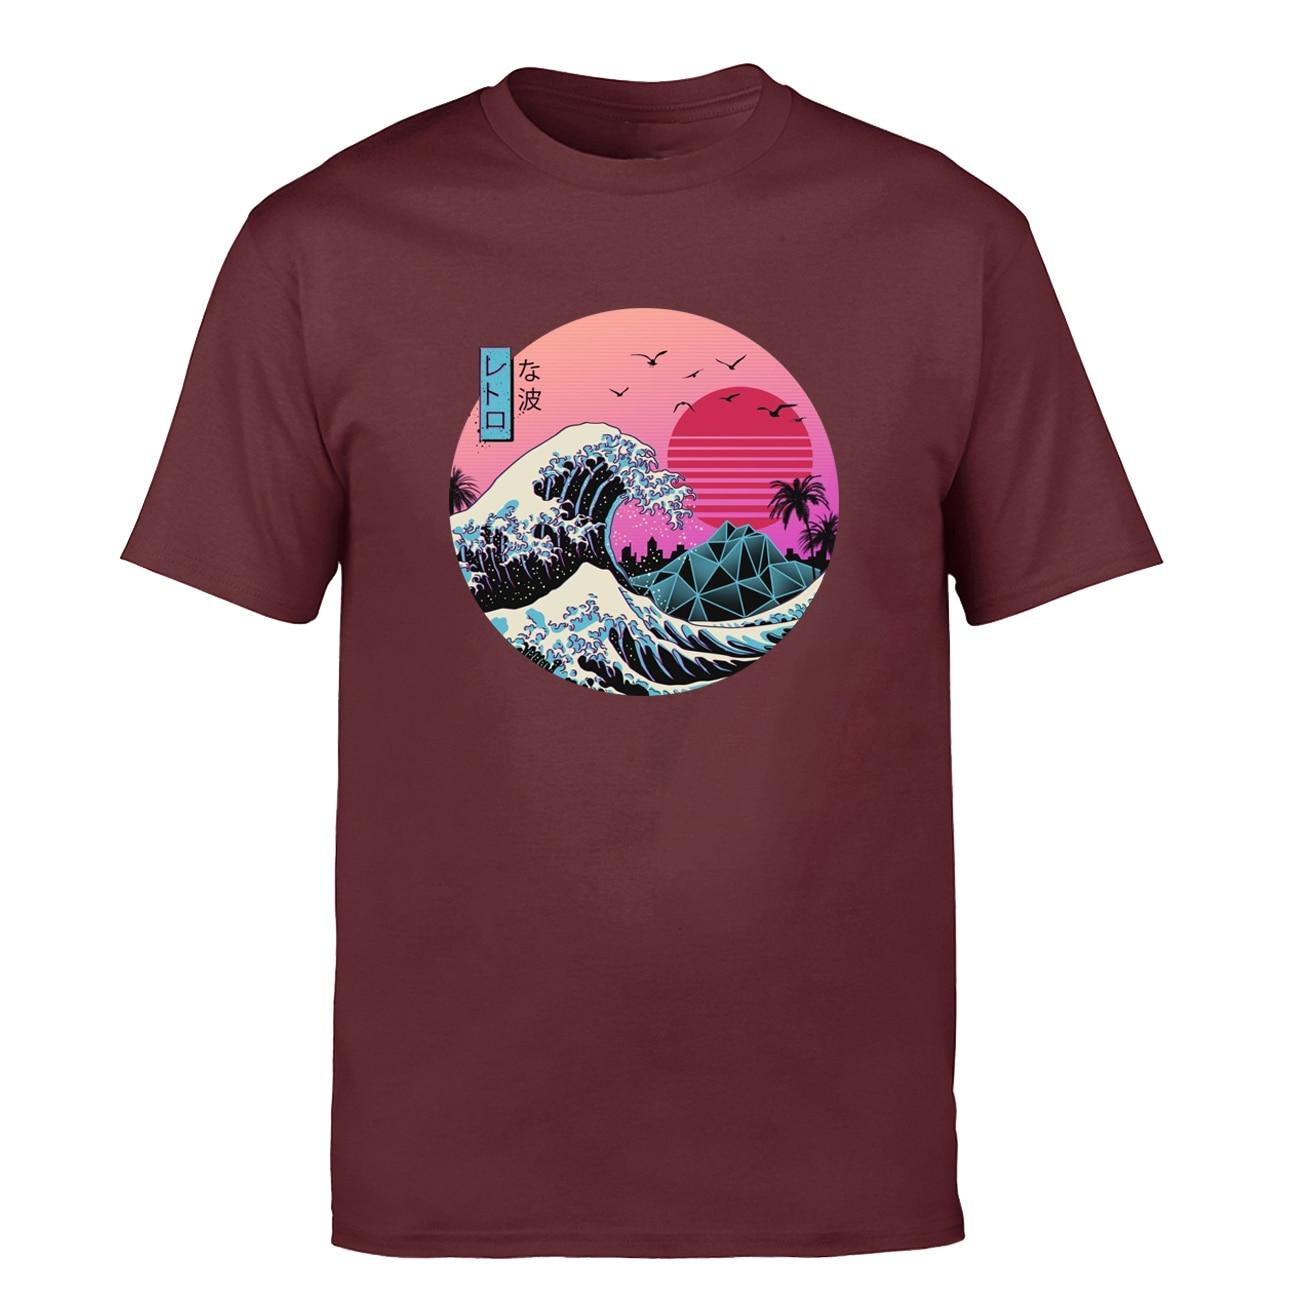 T Hemd Männer Die Große Retro Welle Japan Anime Vaporwave T-shirt Shirts 2019 Sommer Tops Klassische Kurzarm T Harajuku camiseta